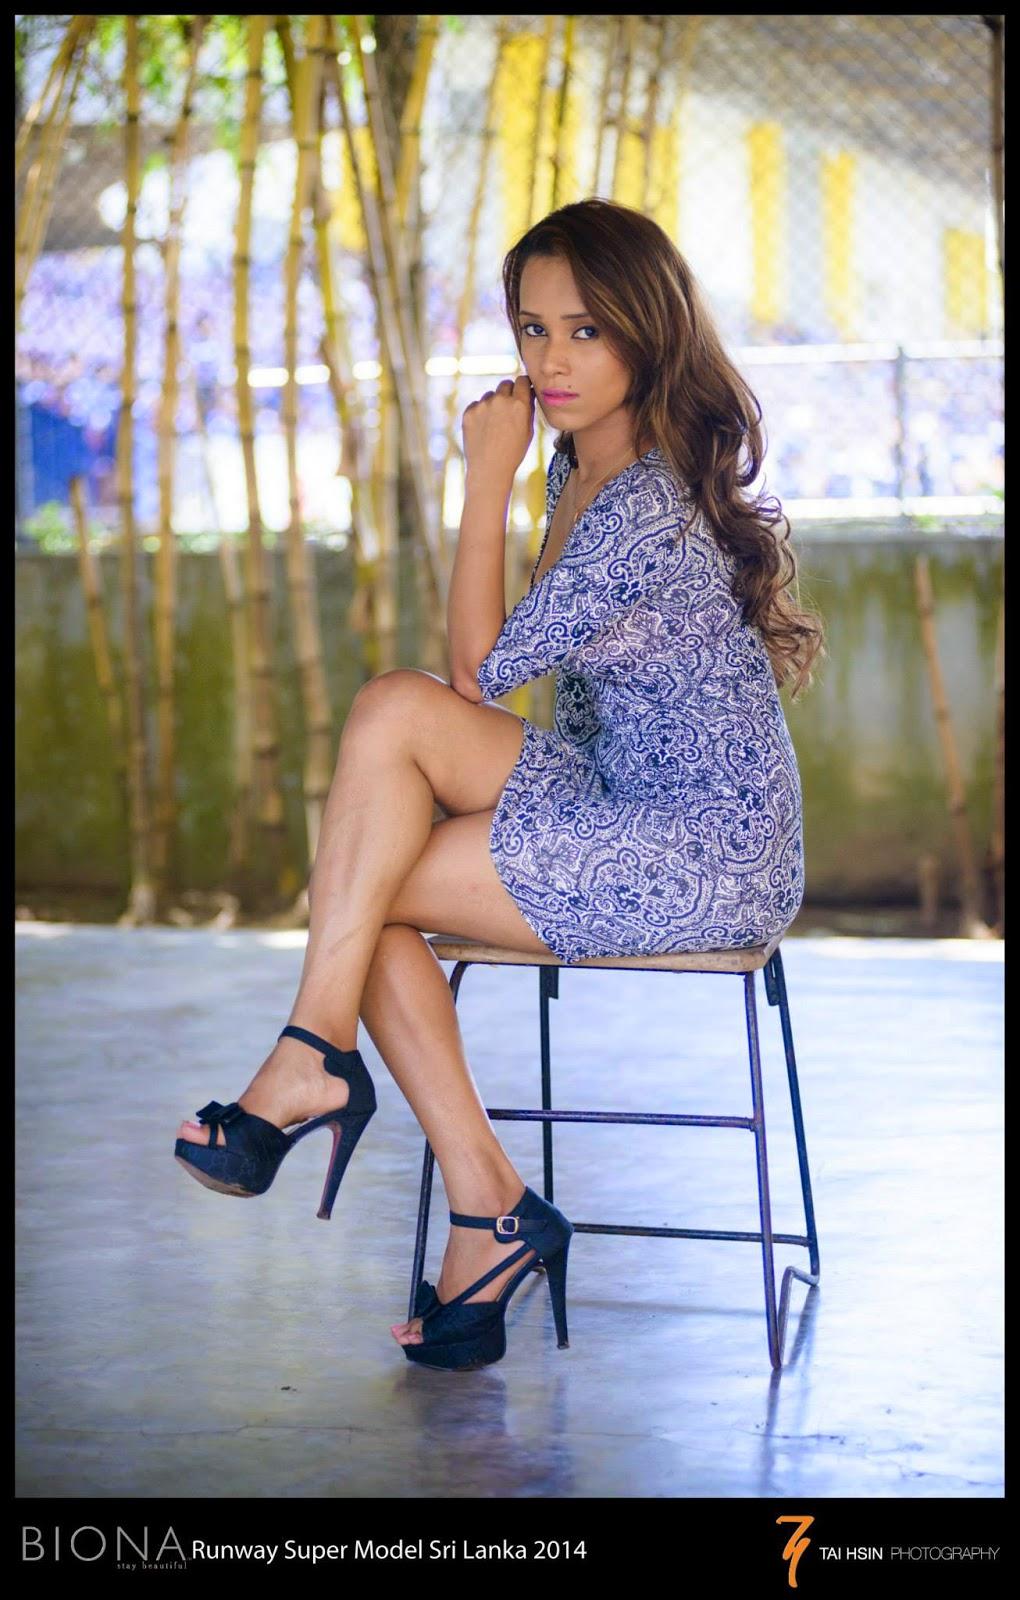 SRI LANKAN TASTE Fashion Magazine: More photos of Hot and